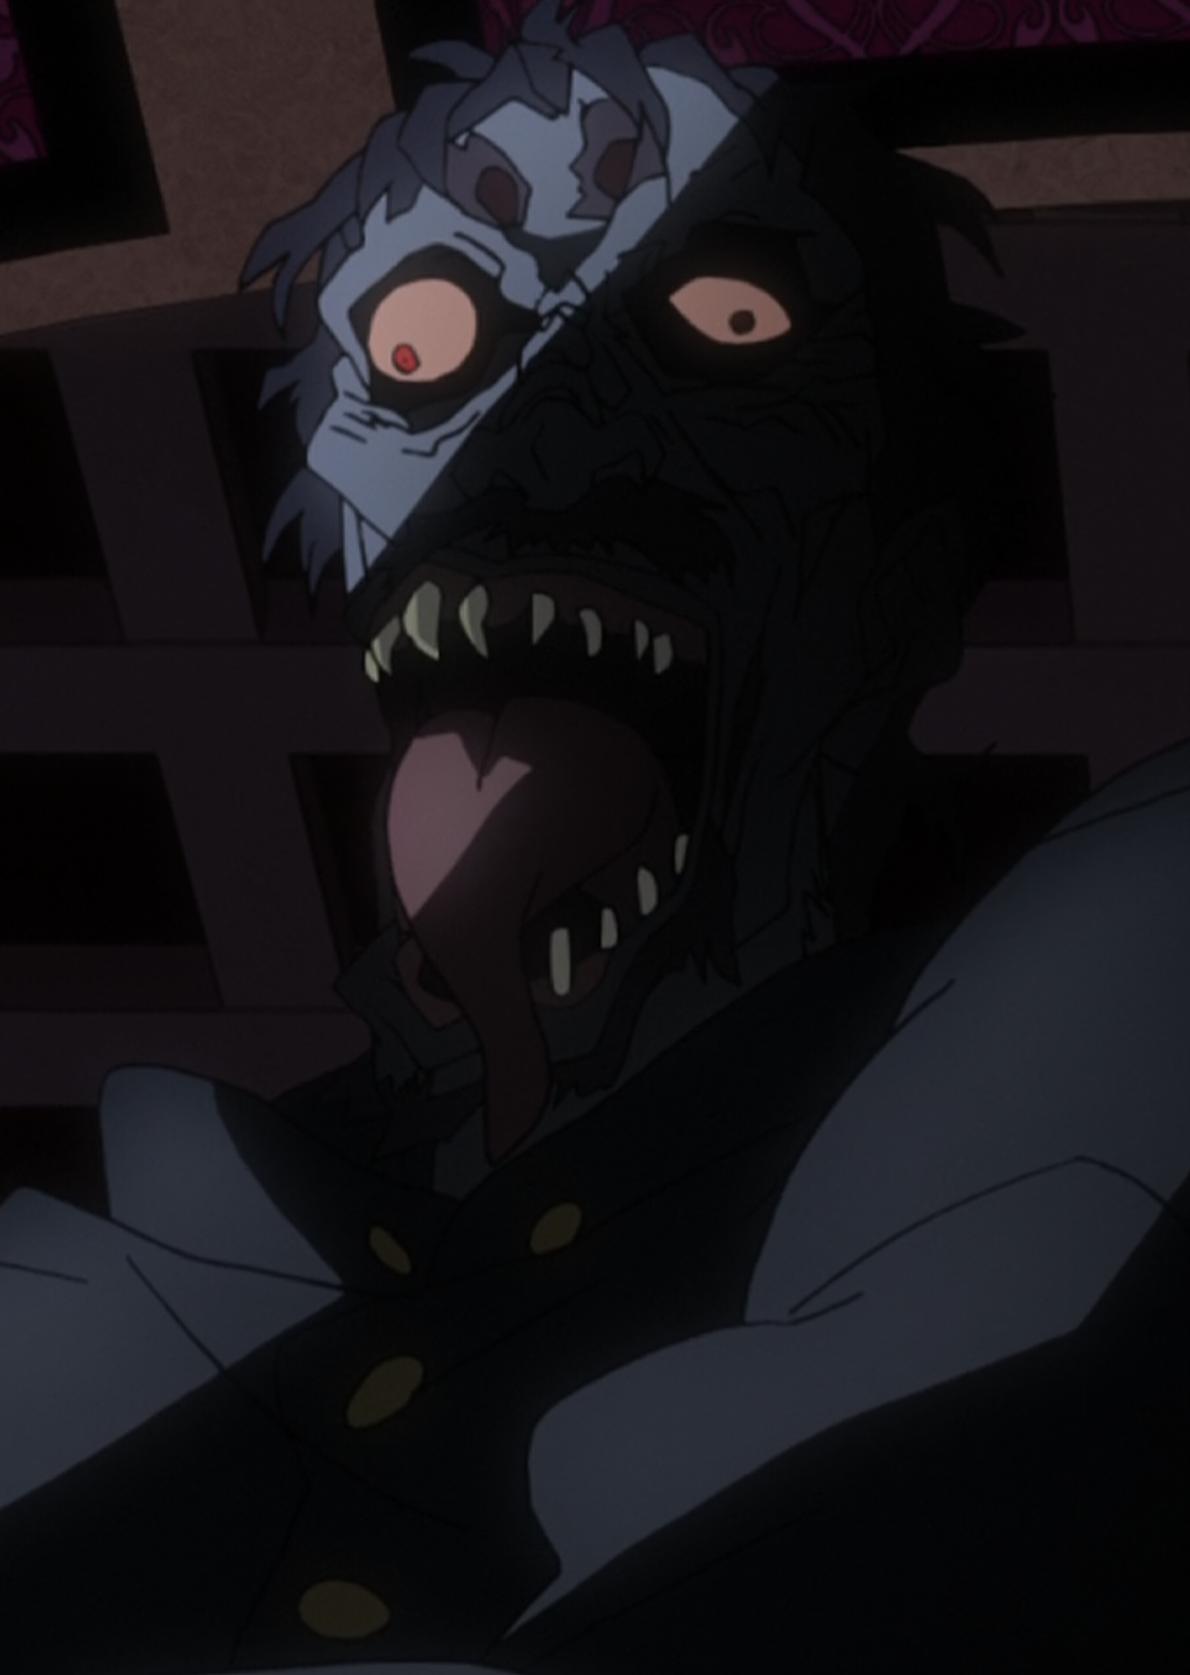 Police Zombie Anime